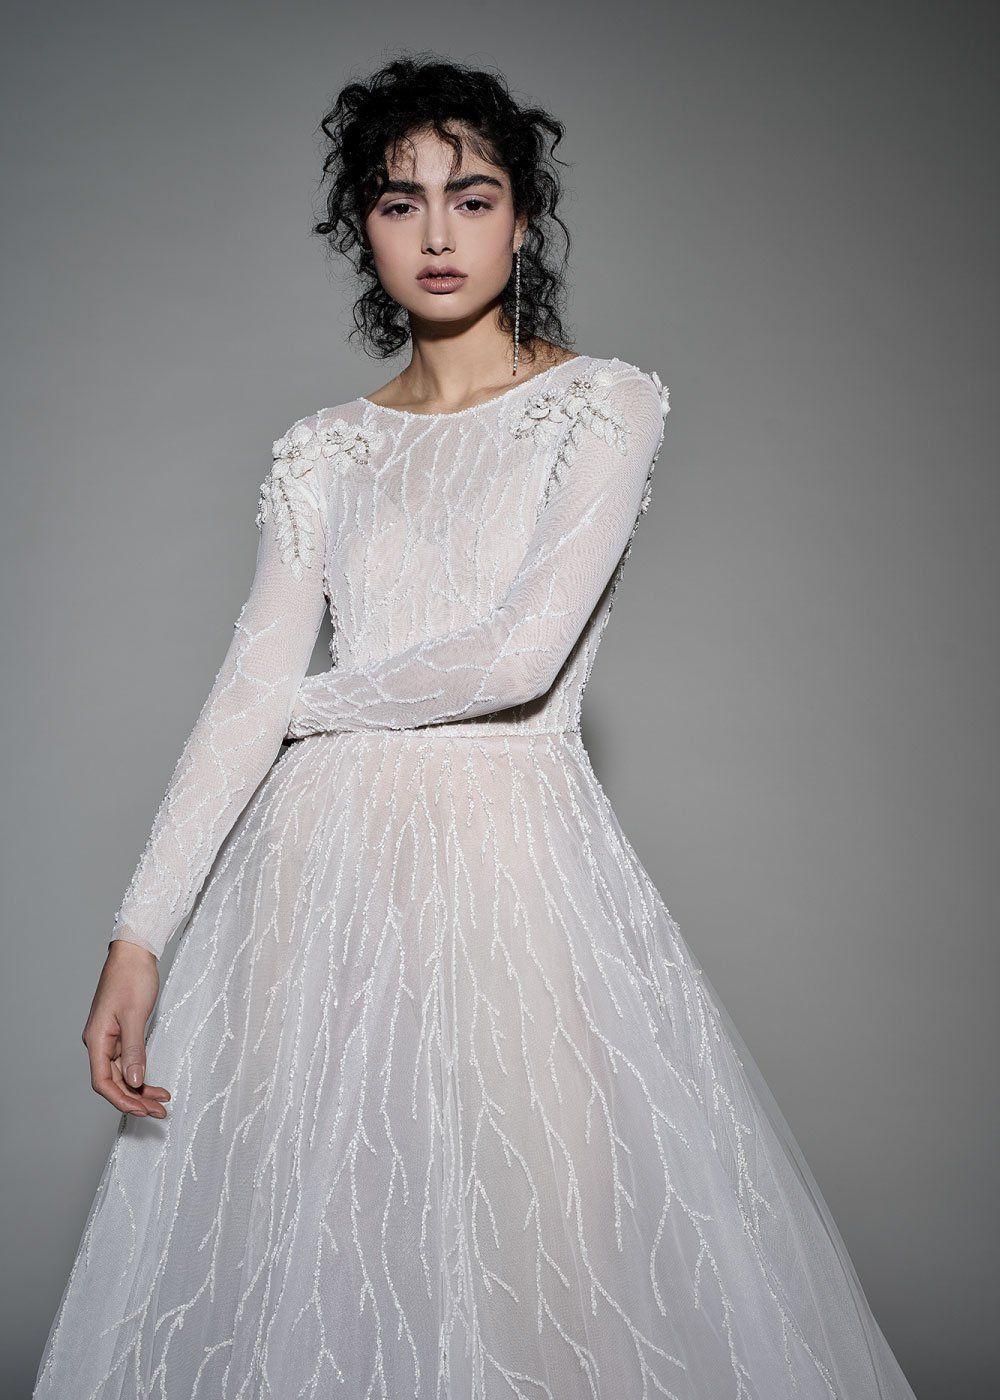 Chana Marelus Bridal #tznius #modest | Modest (tznius) Wedding Gowns ...